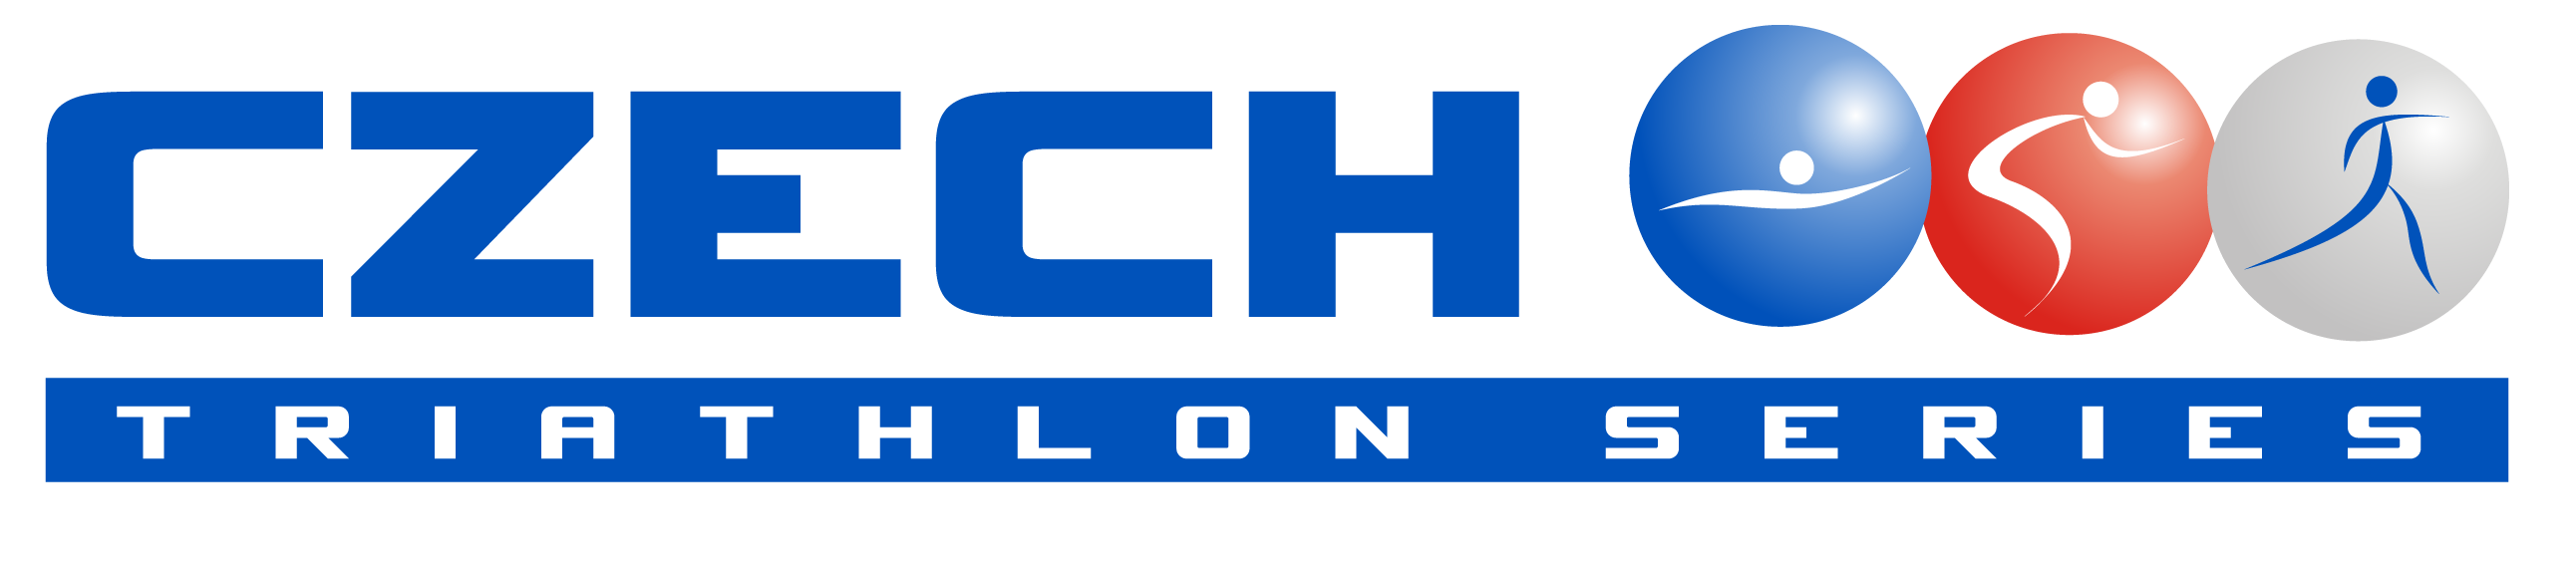 Czech Tri Series